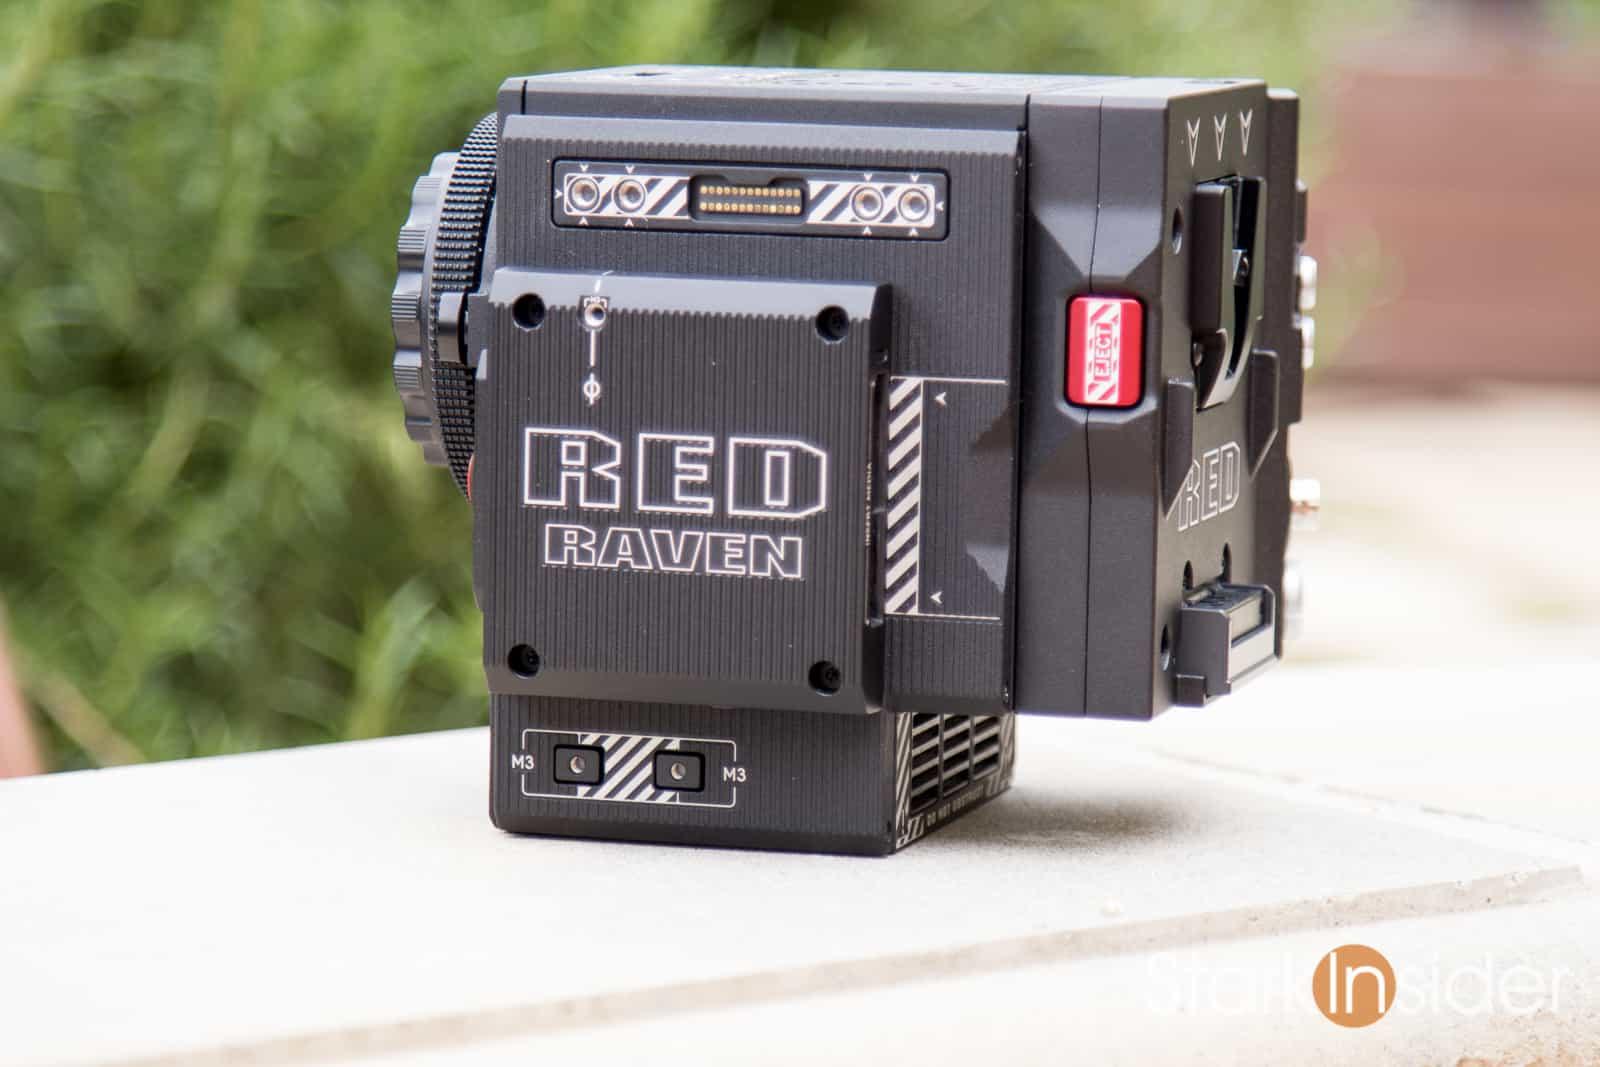 RED-Raven-Camera-Unboxing-Stark-Insider-8735